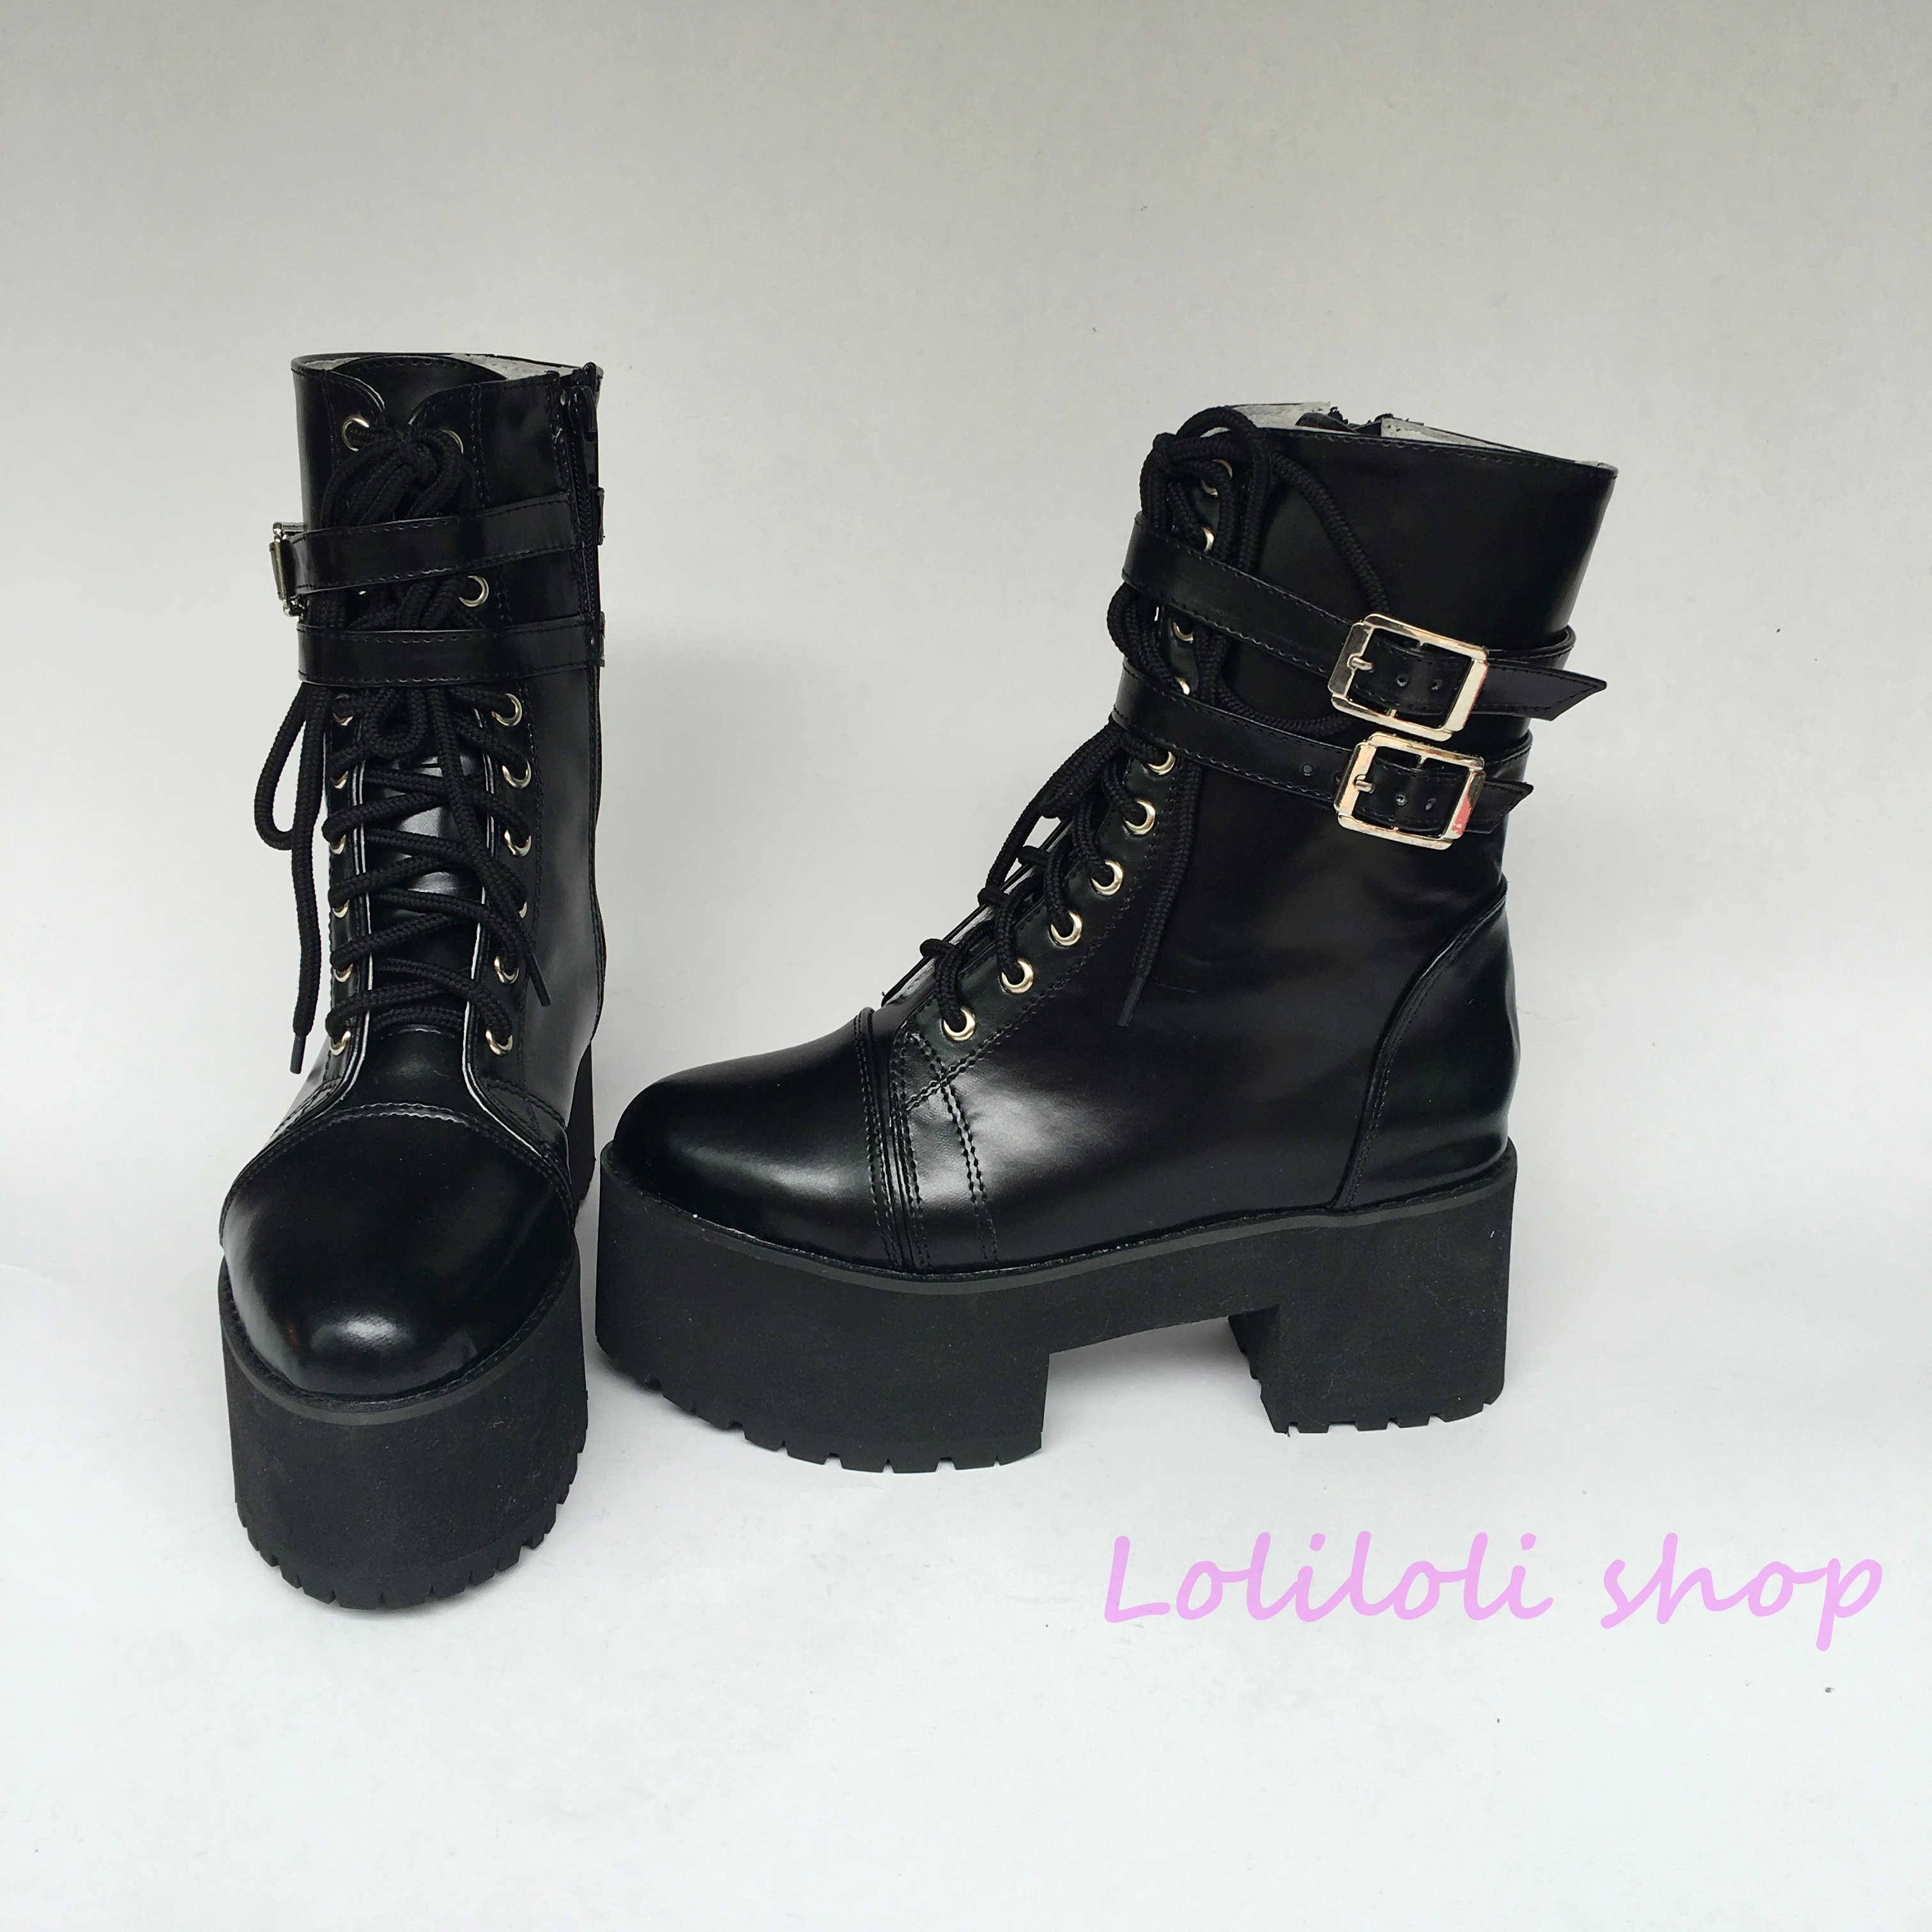 Princess punk shoes Lolilloliyoyo antaina Japanese design cos shoes custom black bright skin cross lacing thick heel boots 5221x